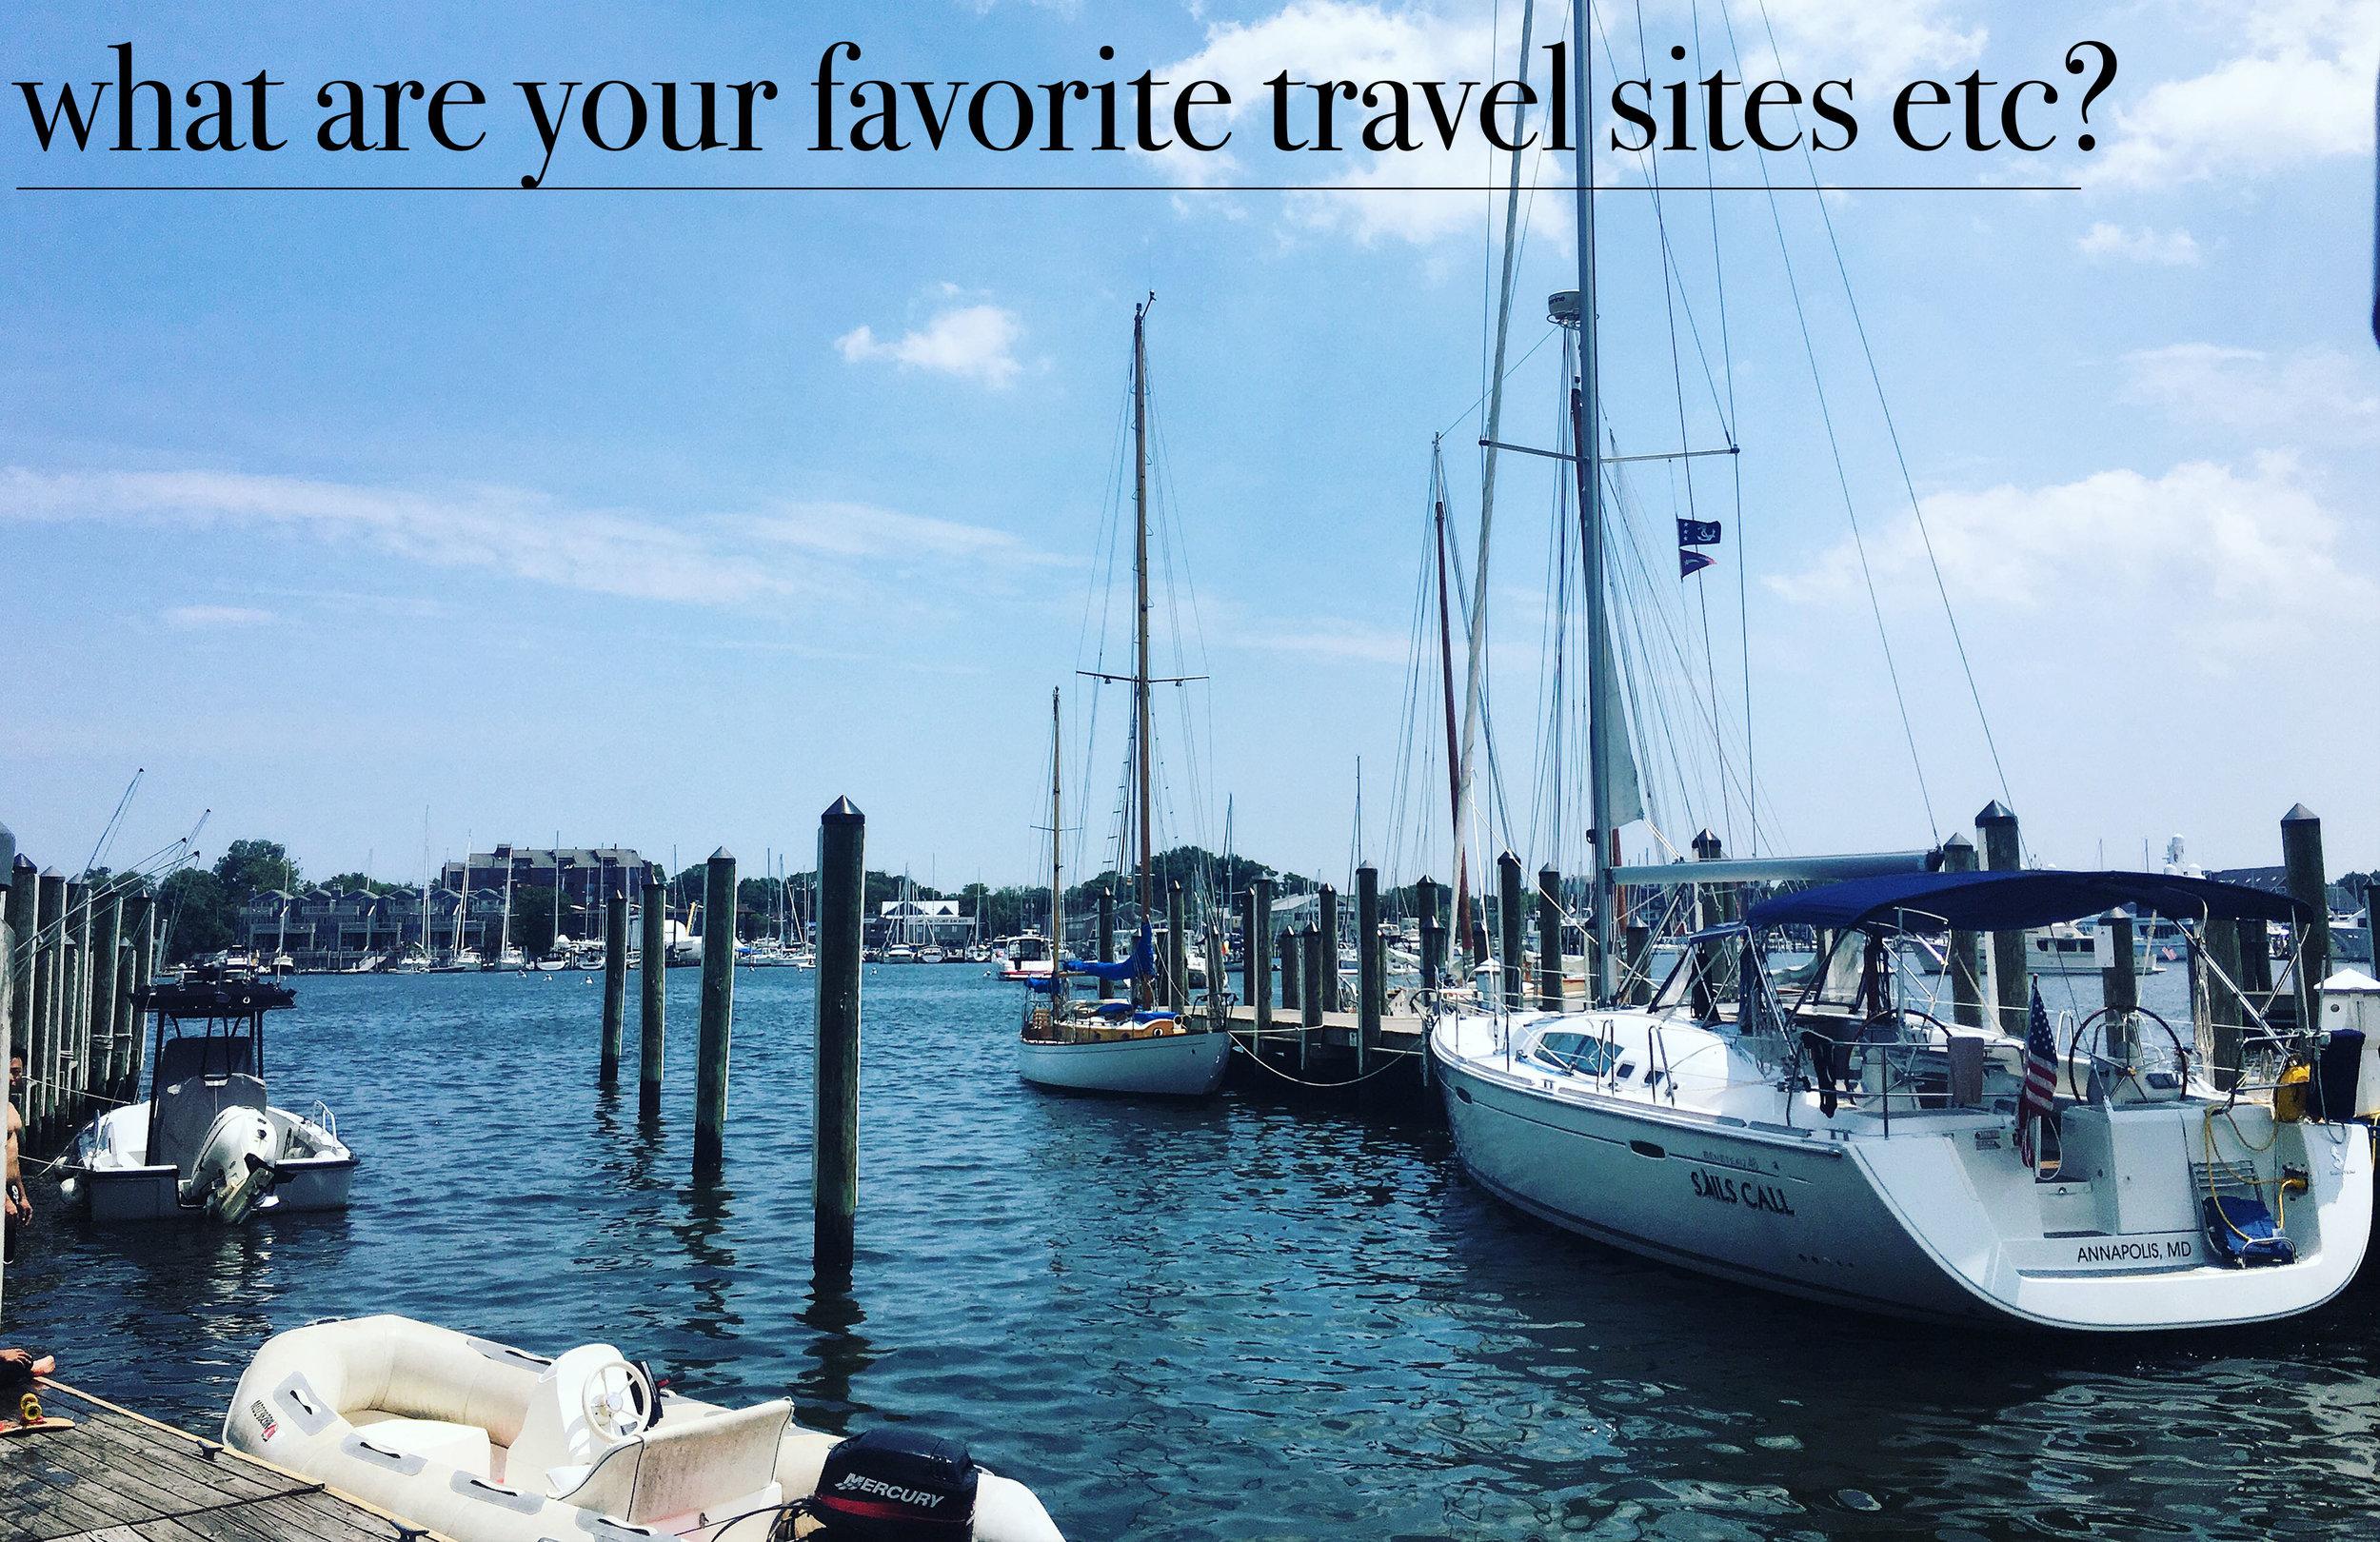 Travel Sites.jpg